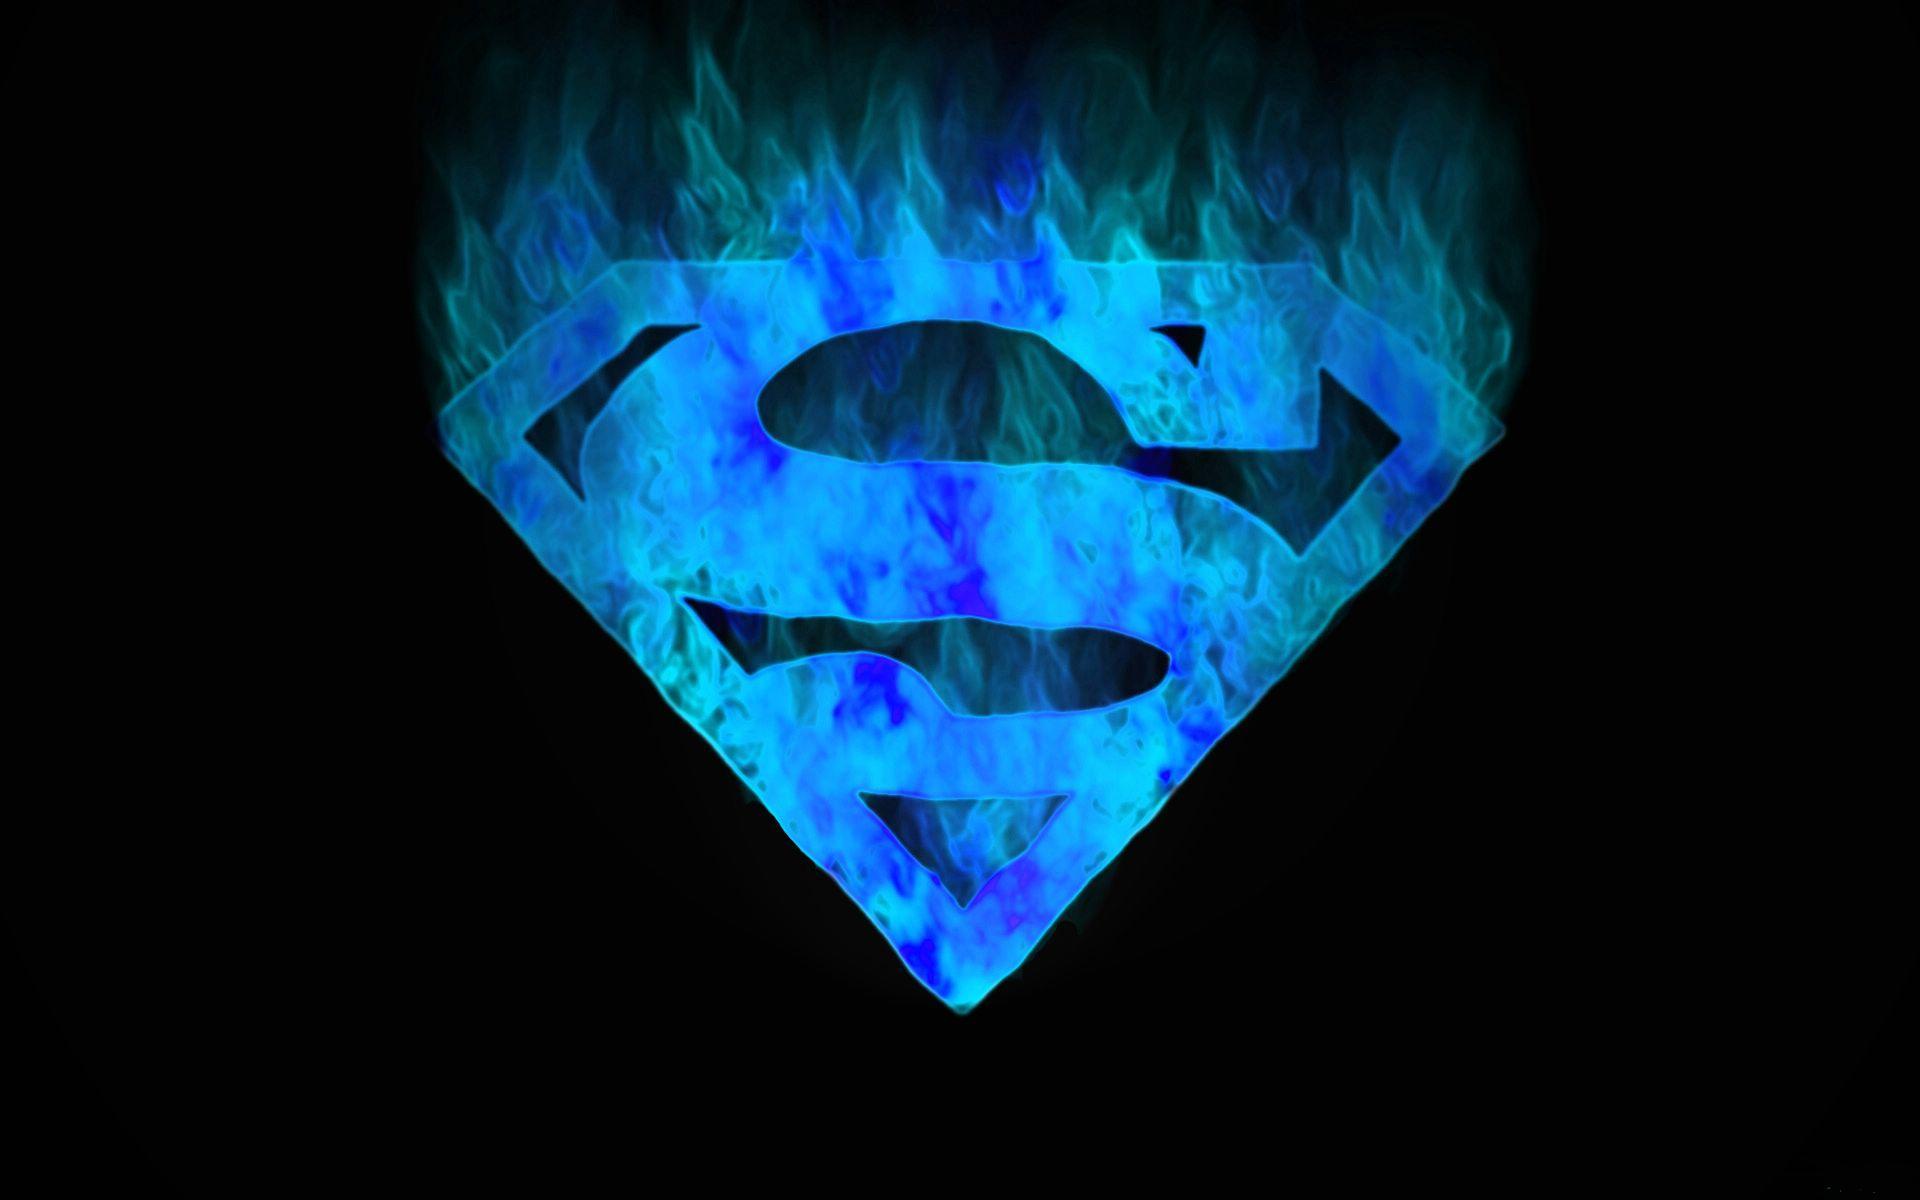 Blue Superman Logo HD wallpaper